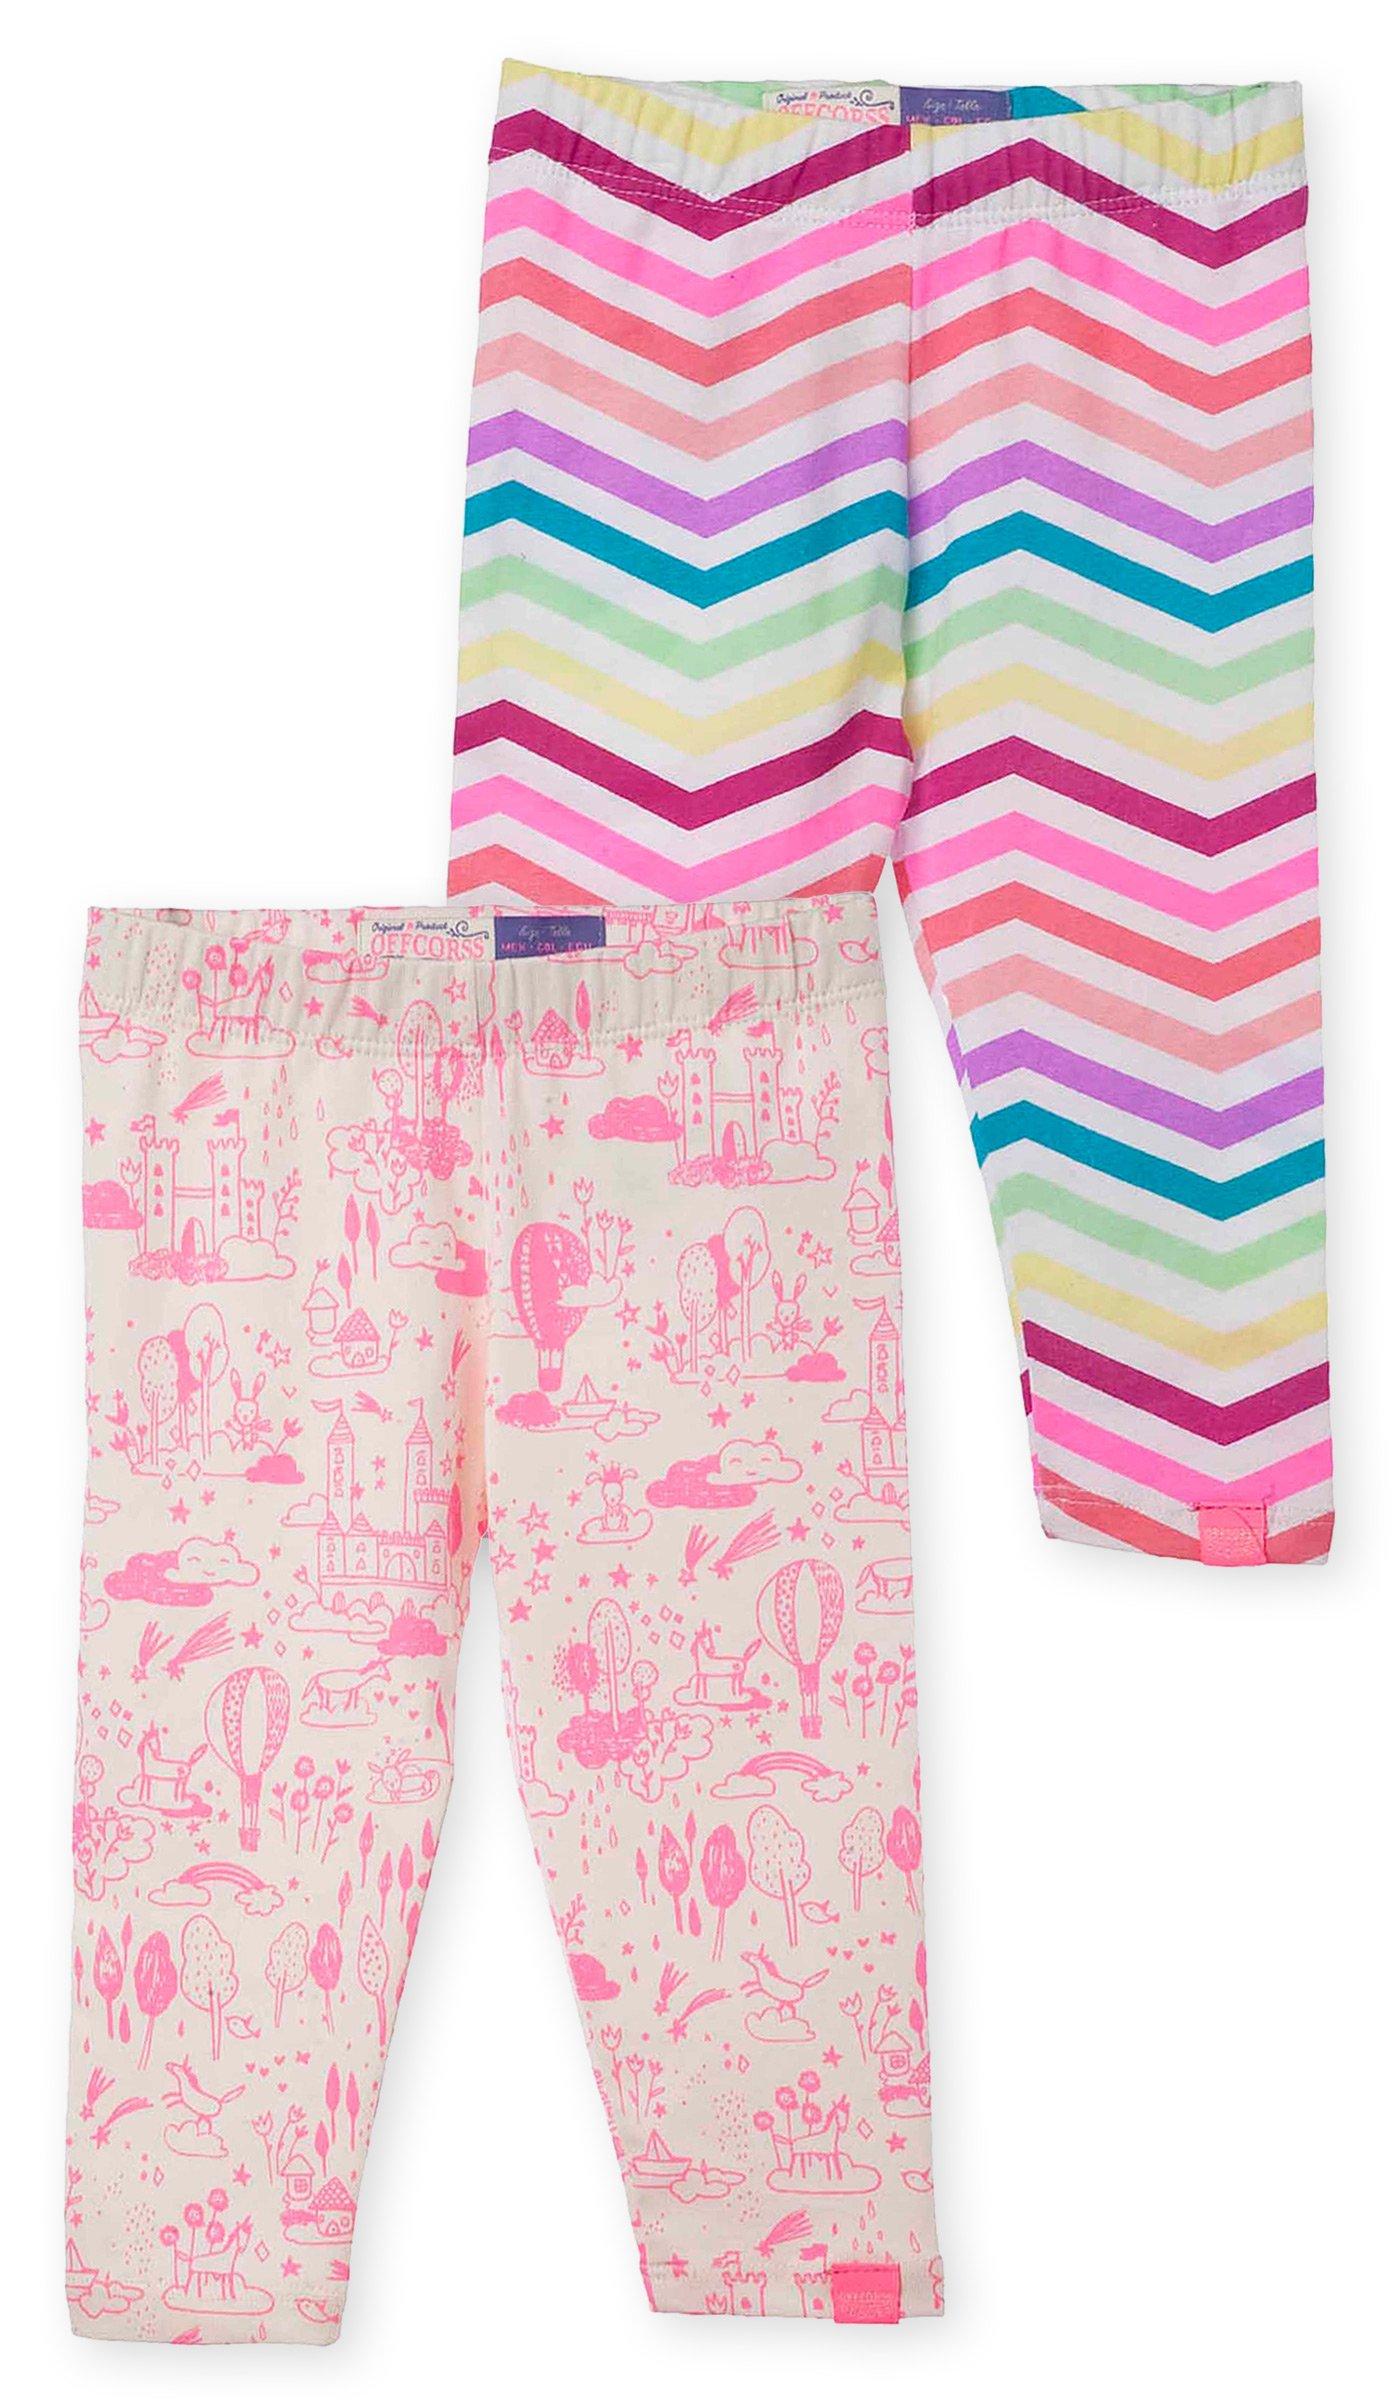 OFFCORSS Baby Girls Newborn Colored Capri Patterned Cotton Leggings Summer Clothes Ropa de Bebe Niña Recien Nacida 2 Pack Set Kit 3/6 Months